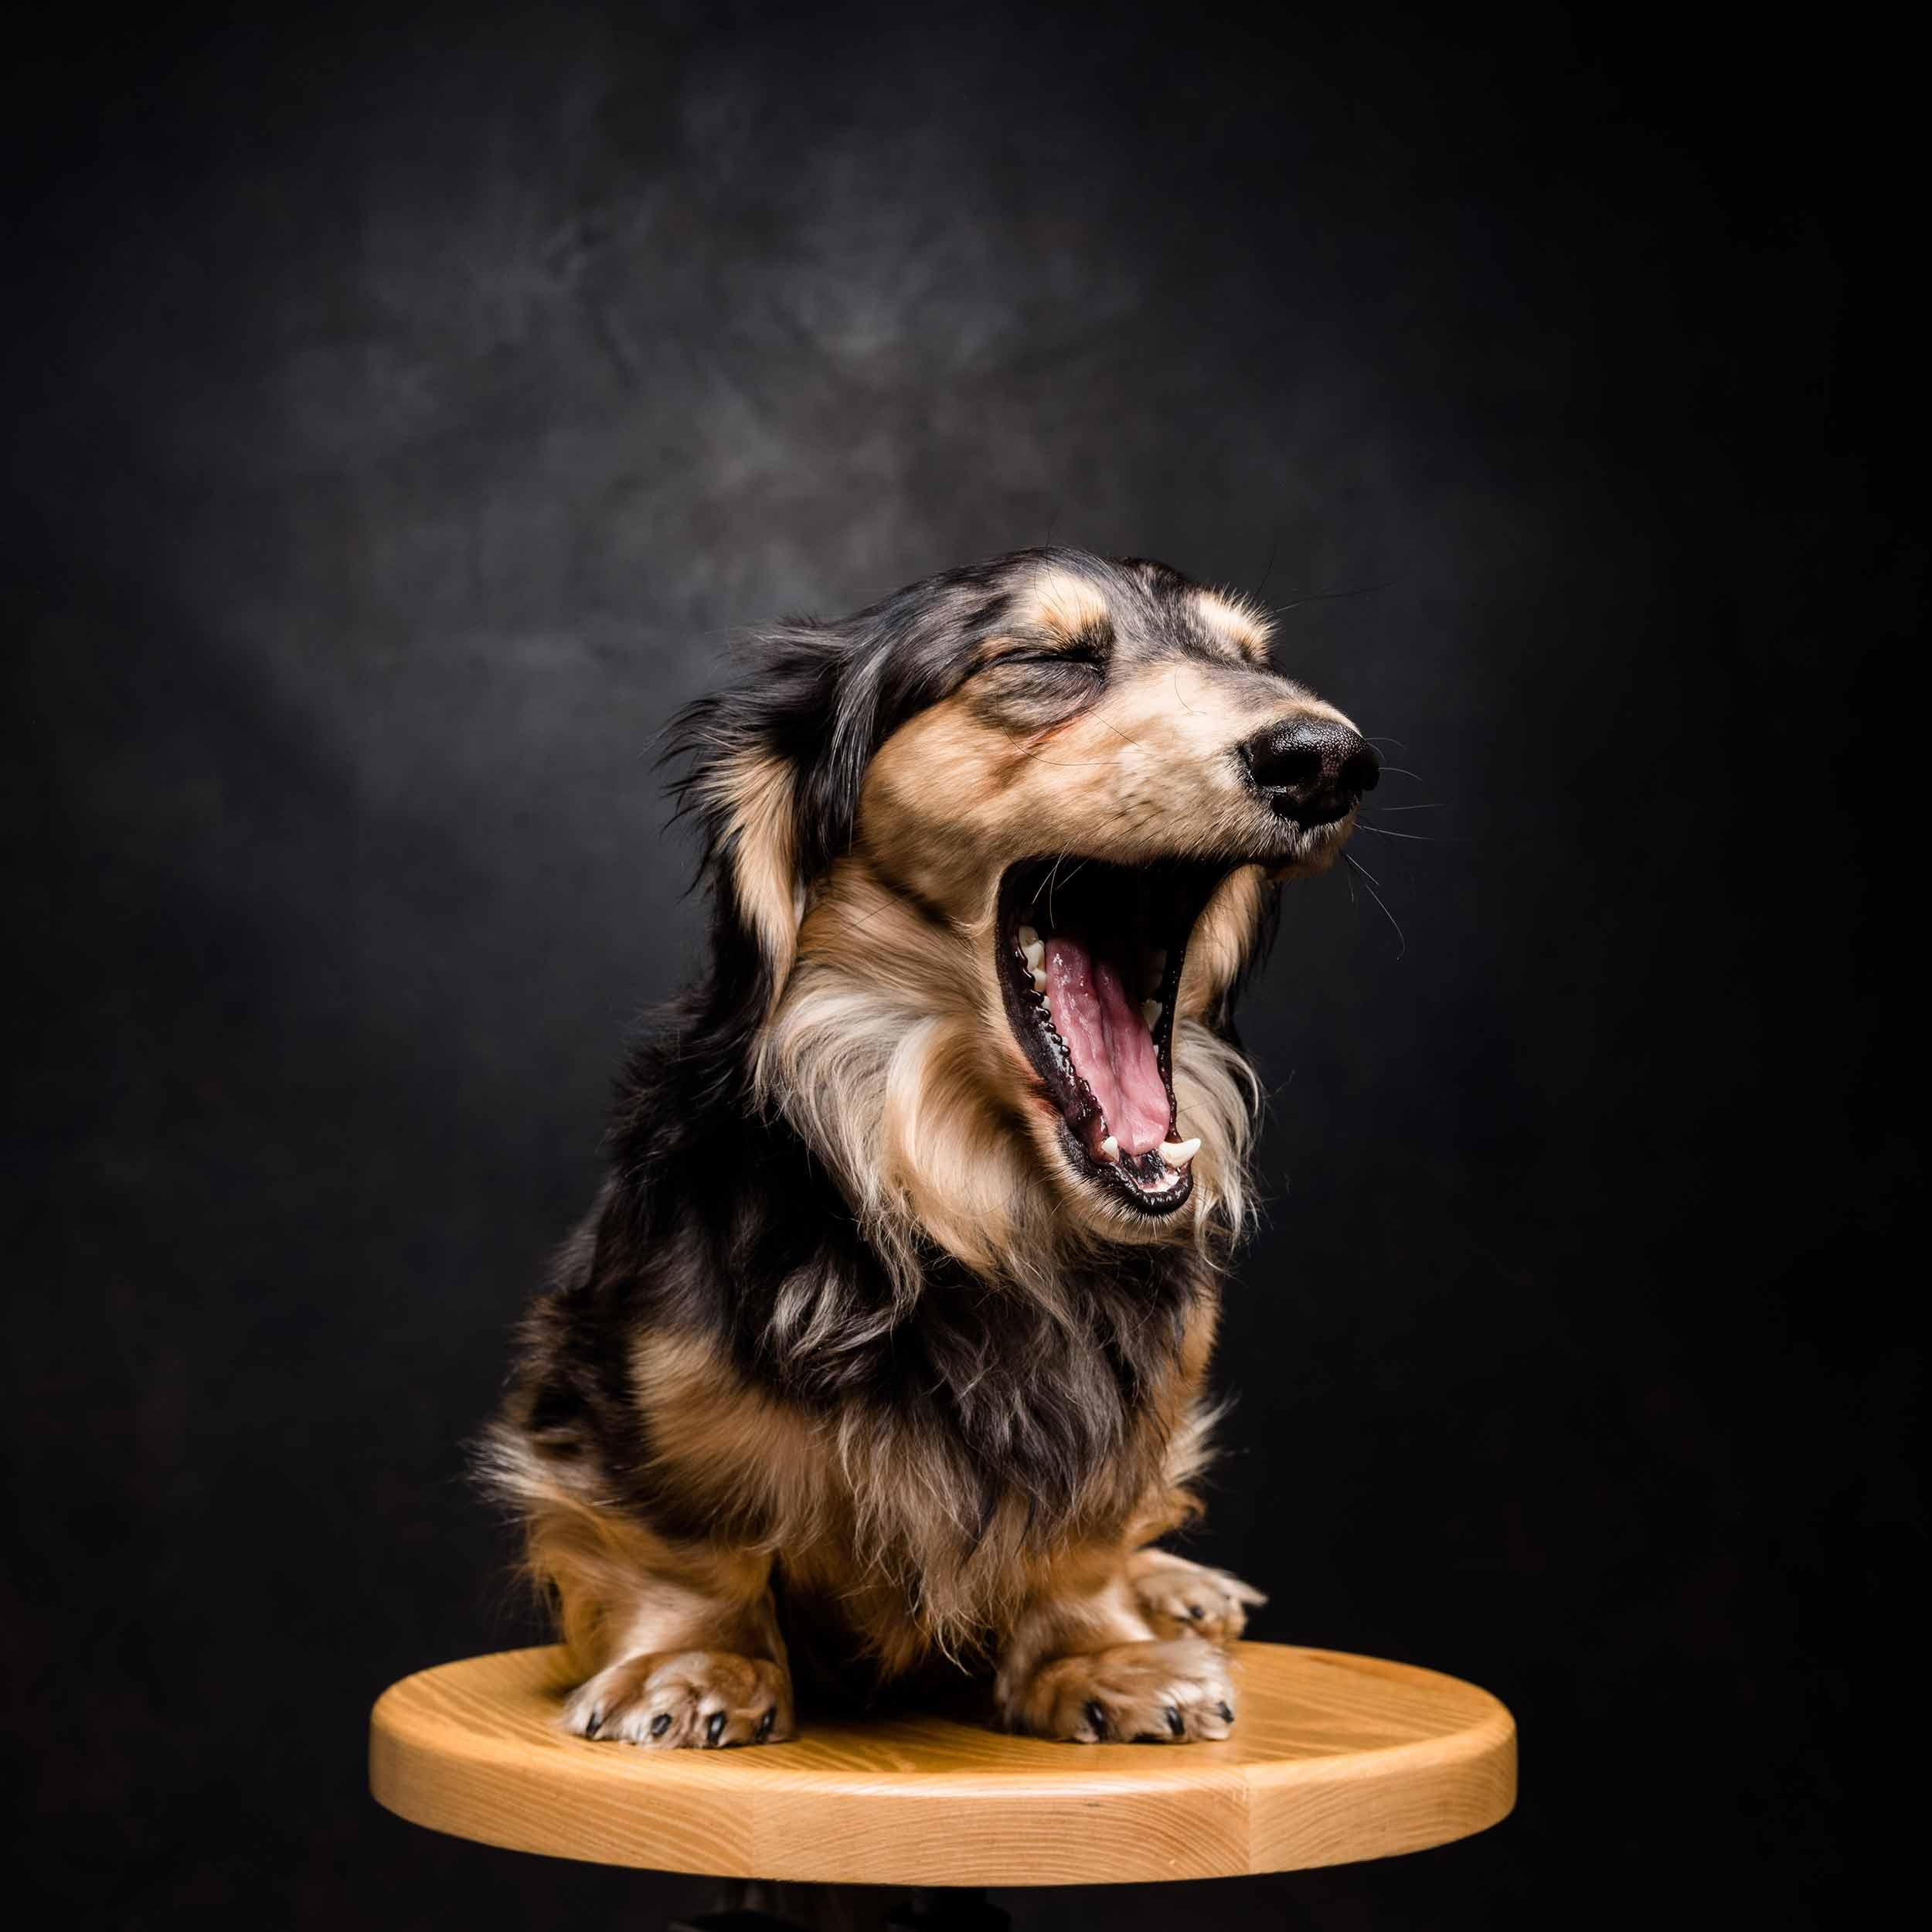 12.01---Dogs-Life_0038_8466.jpg